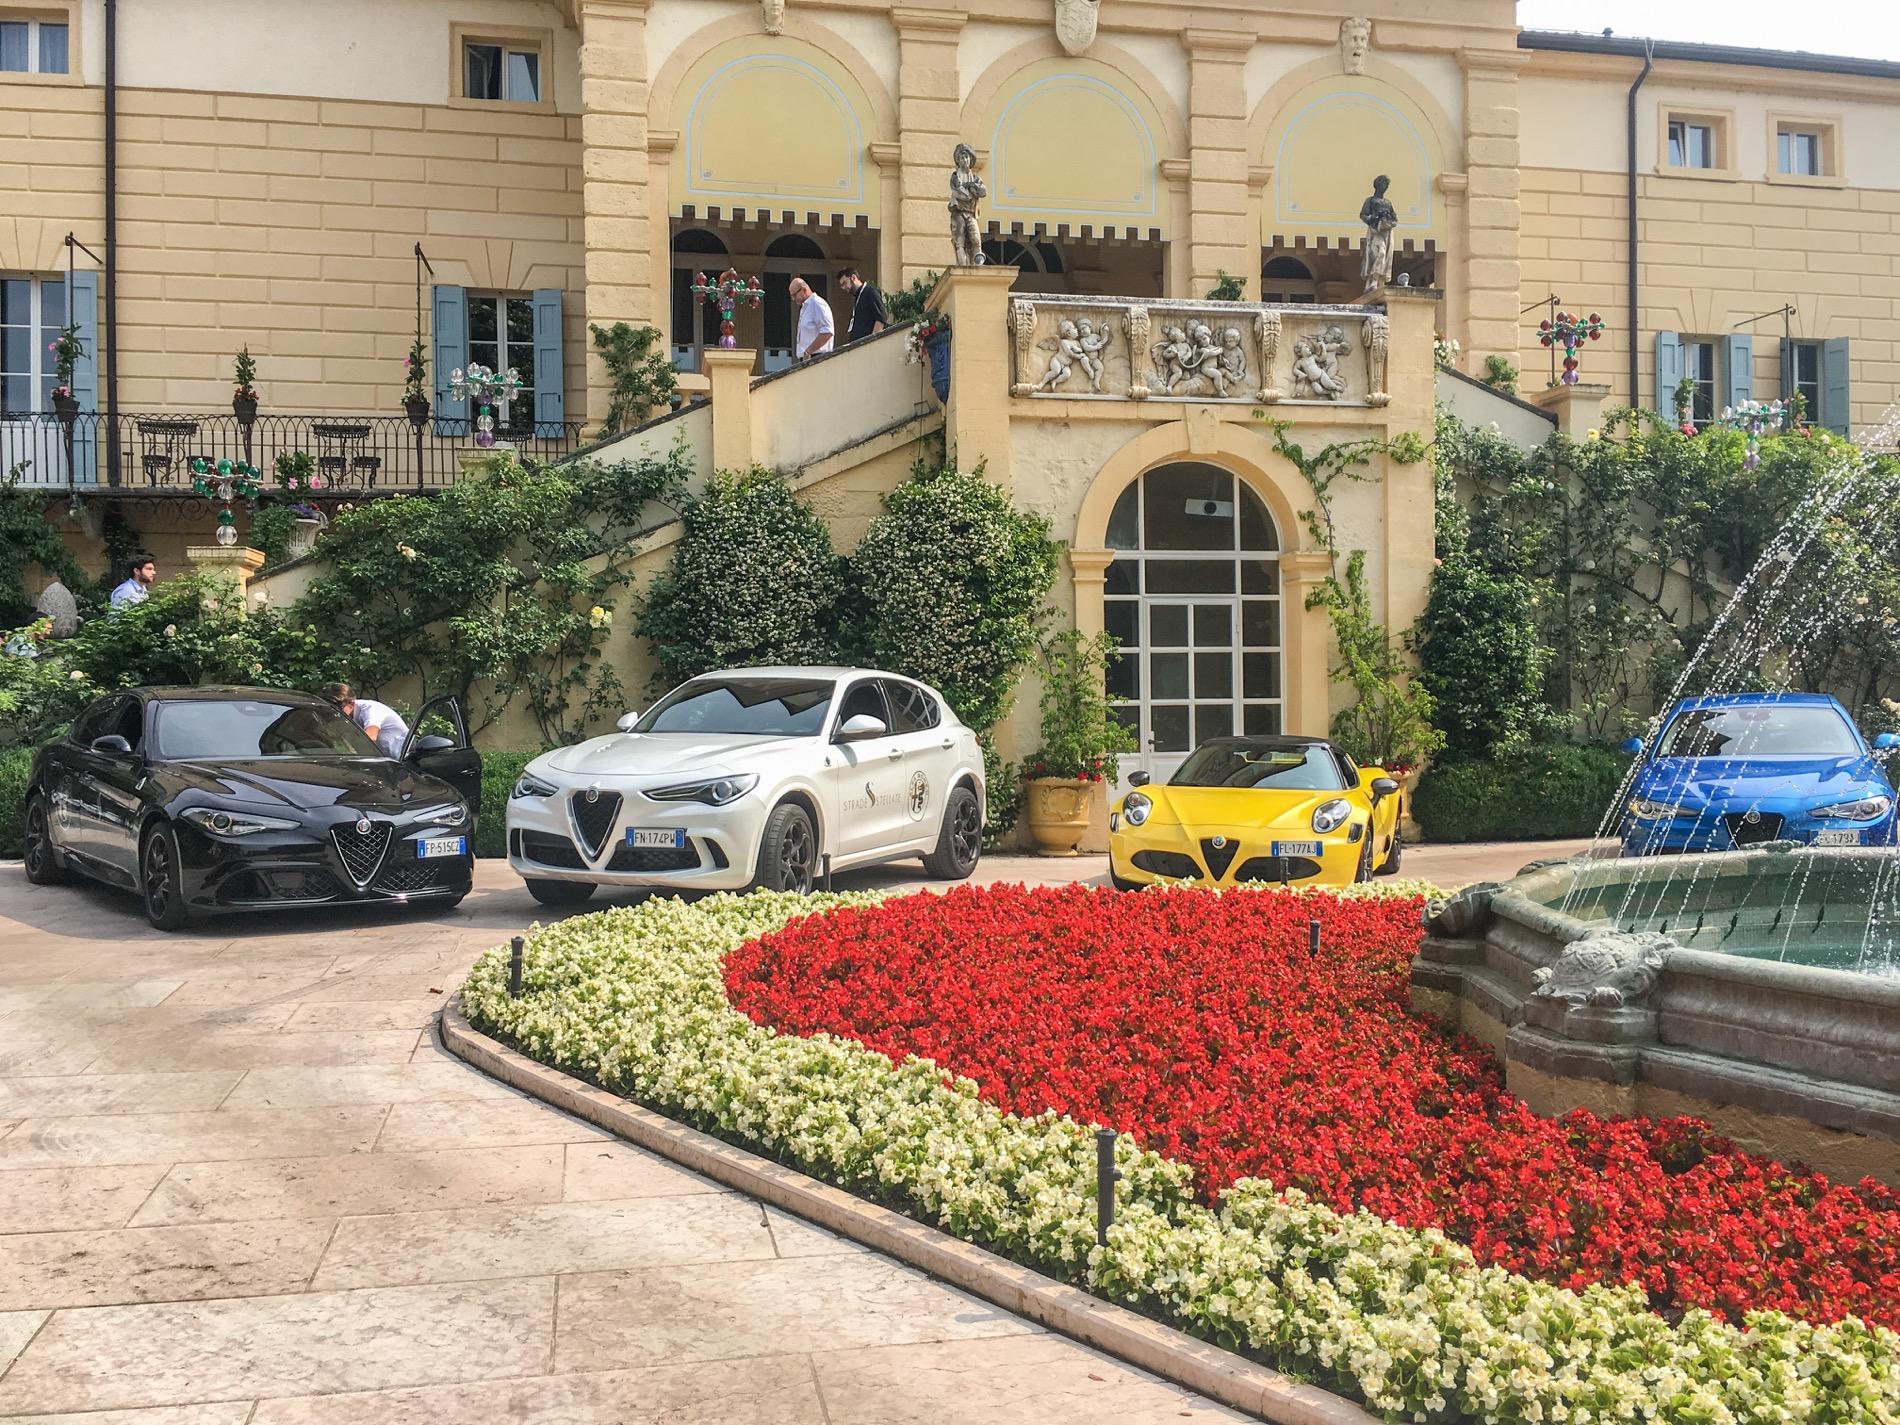 Byblos Art Hotel Villa Amistà – Strade Stellate